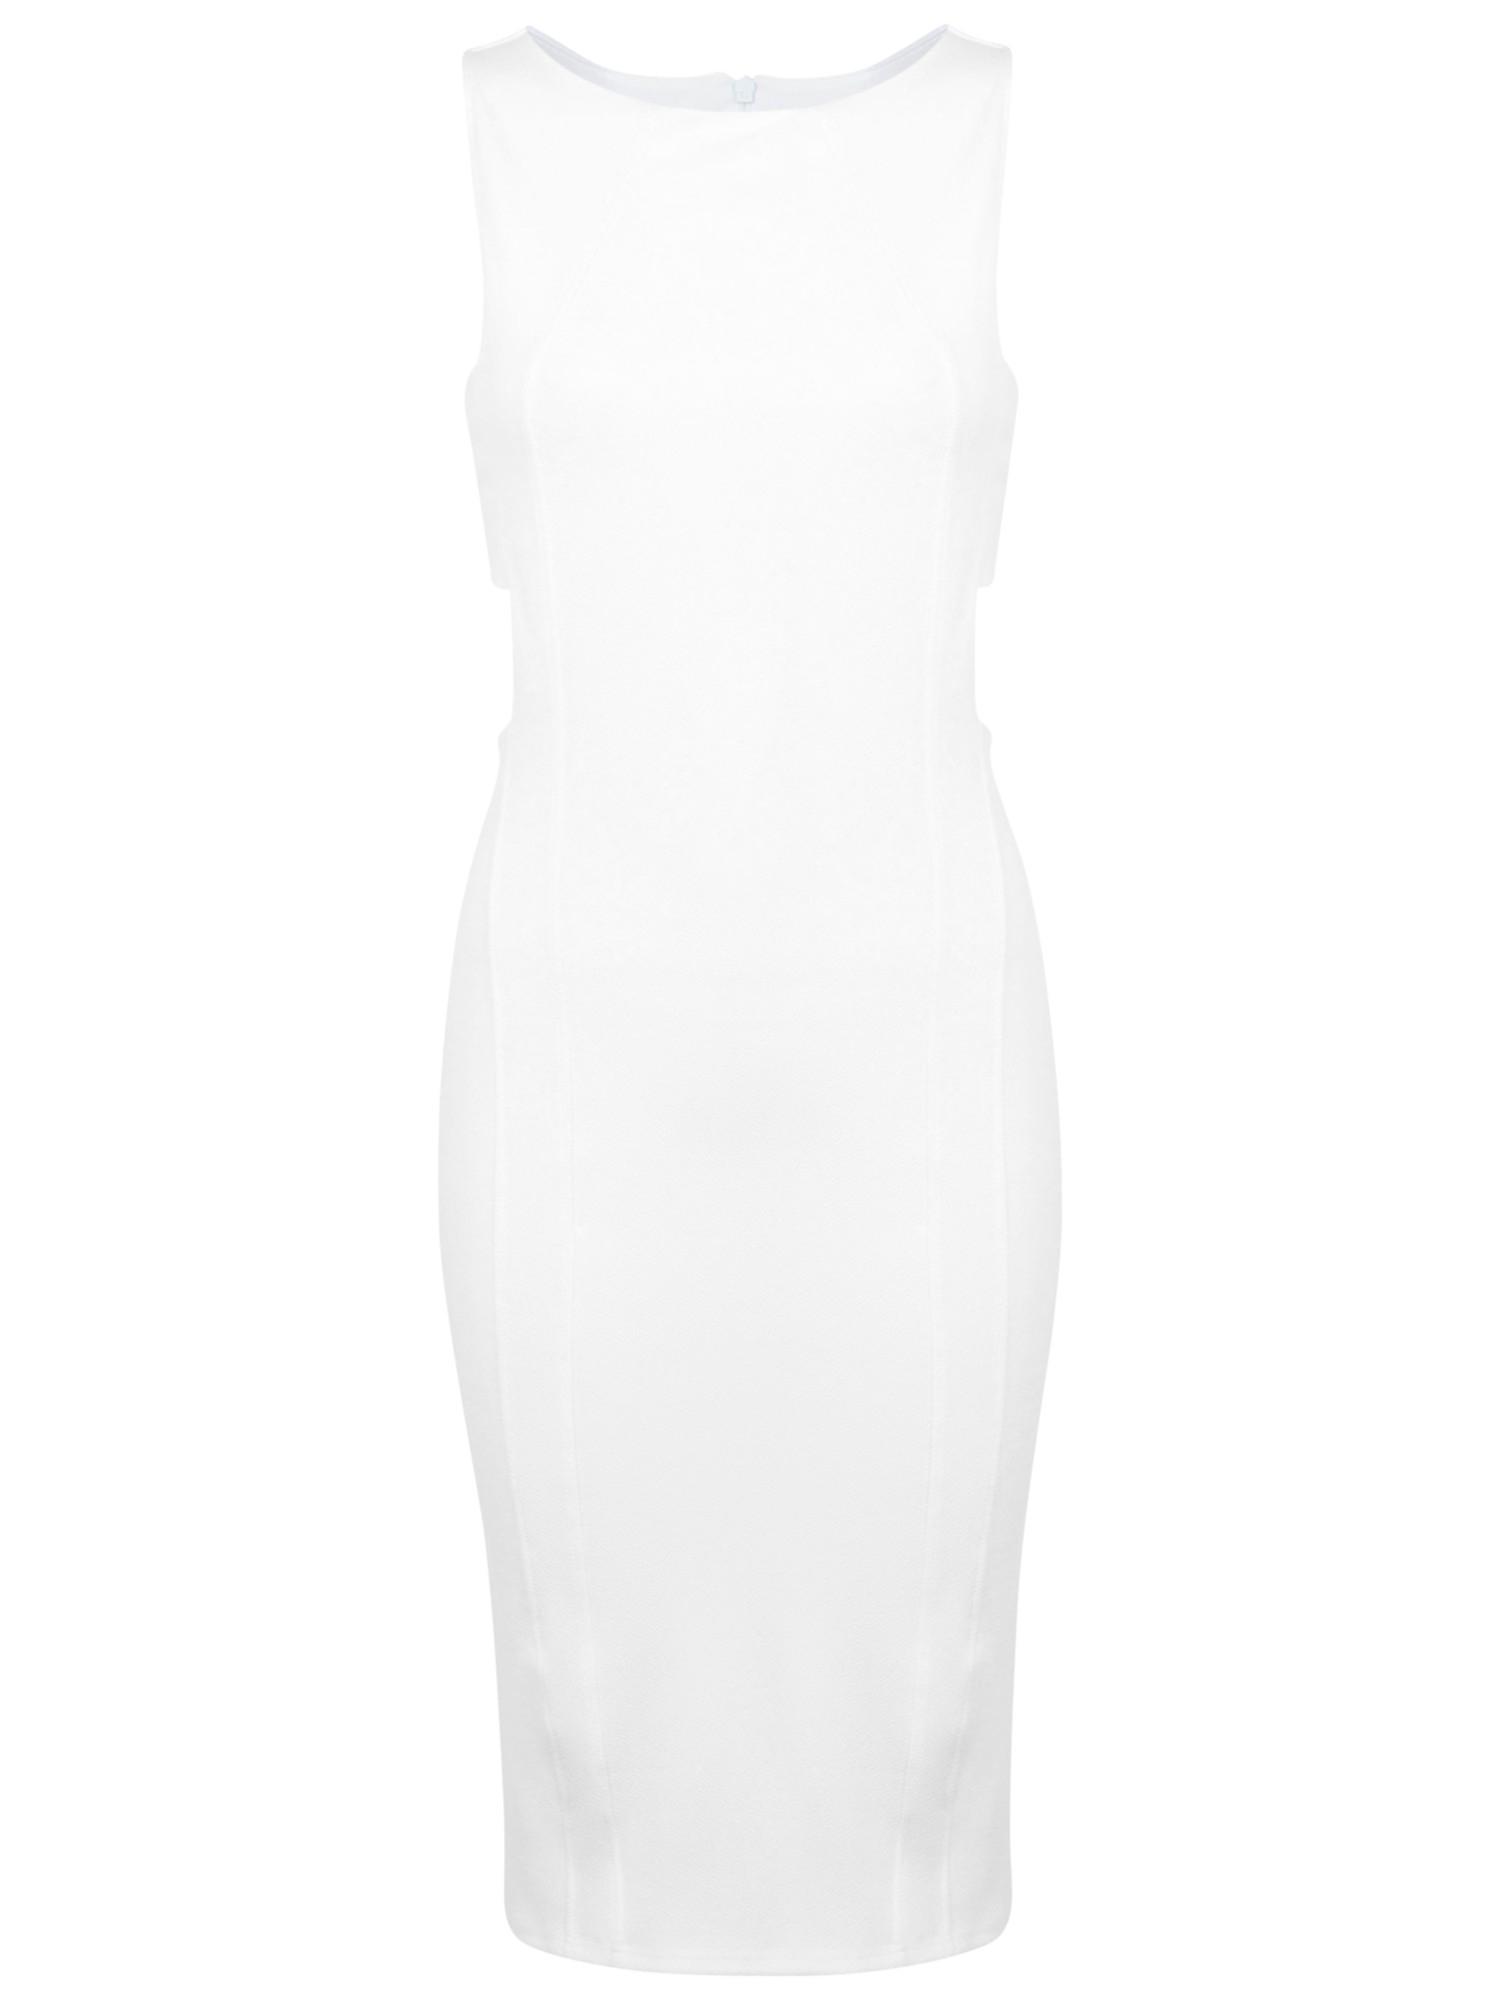 Womens Side Cut-Out Dress Miss Selfridge 6VVZbb9w0w